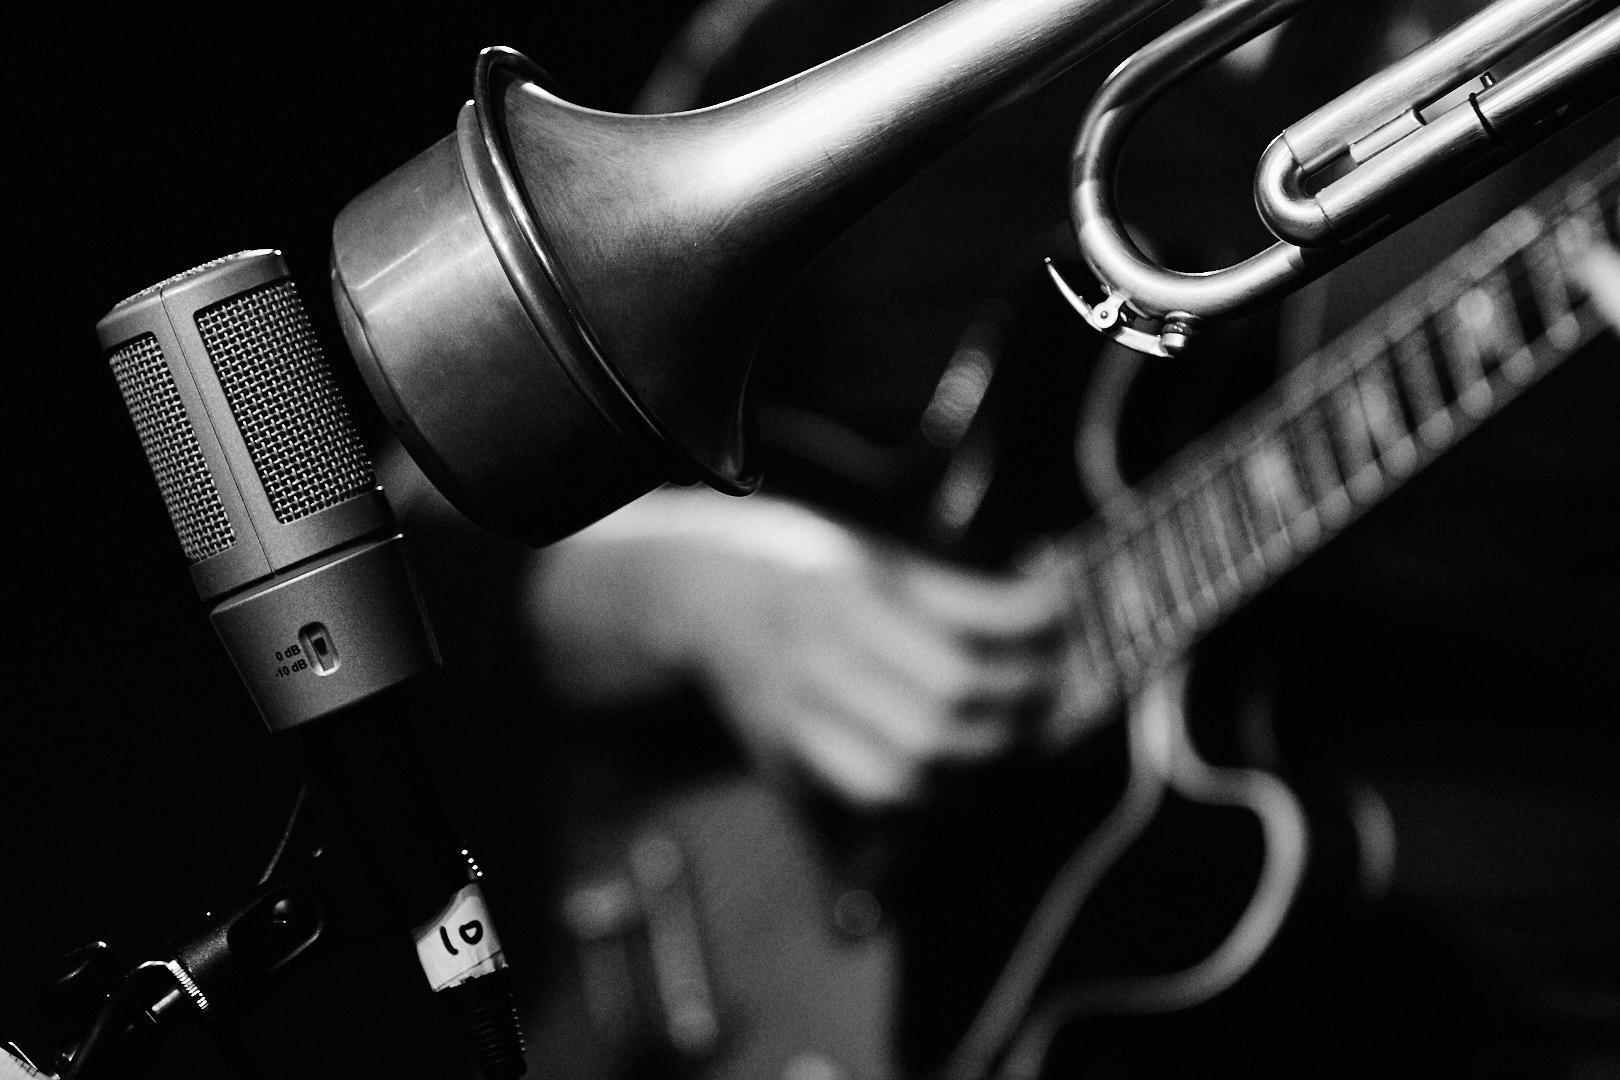 Pvk Photo | Photographe professionnel | Trompette de Brice Moscardini et la guitare de JP Raillot